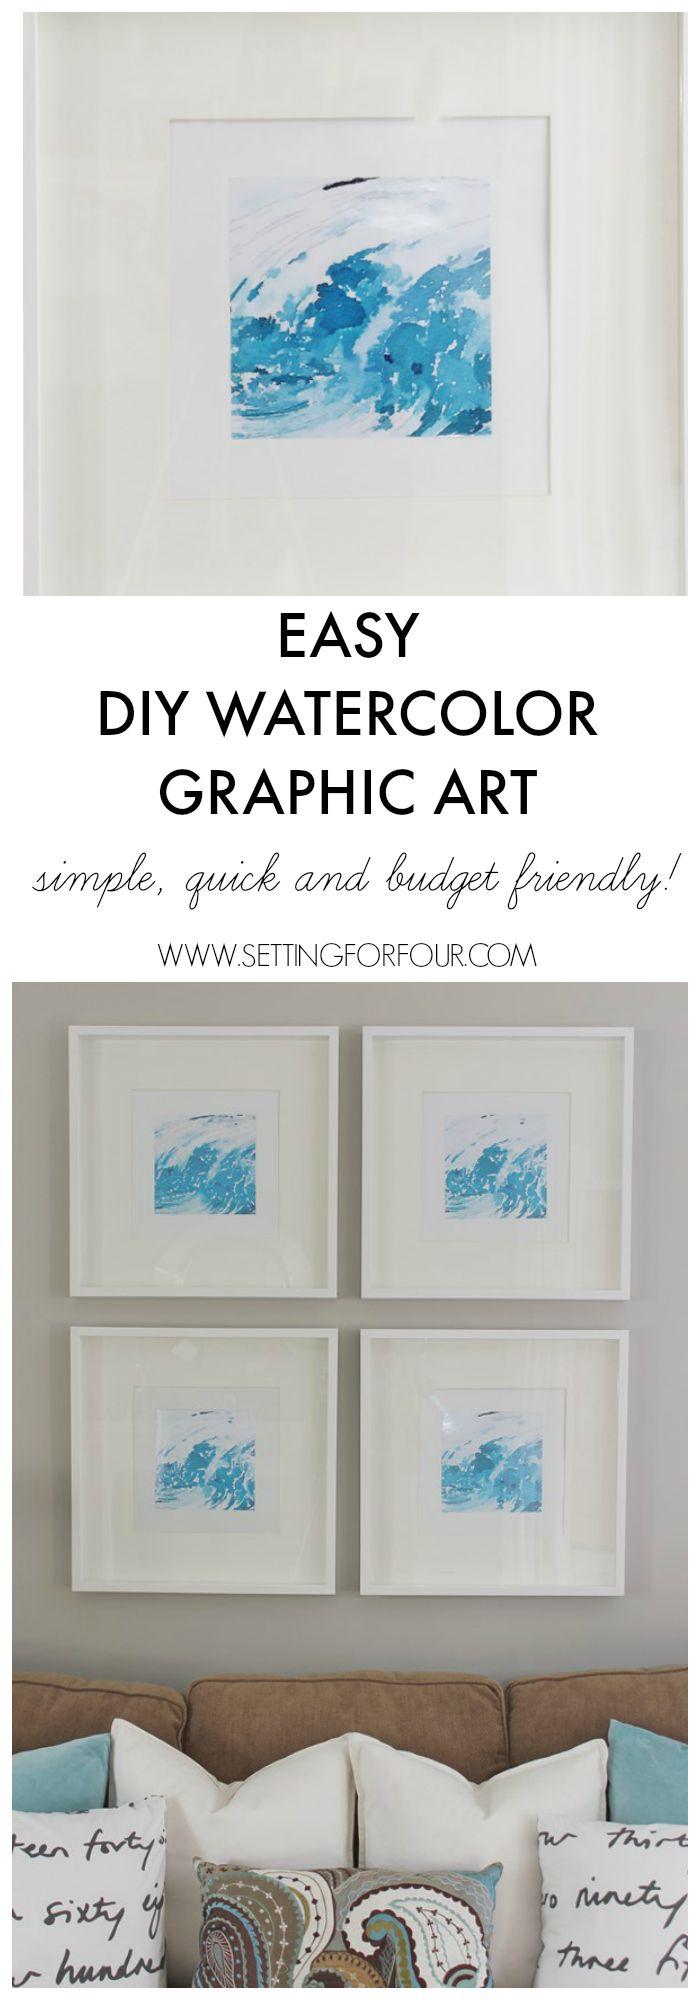 Diy Watercolor Wall Art Diy S Watercolor Art Diy Diy Art